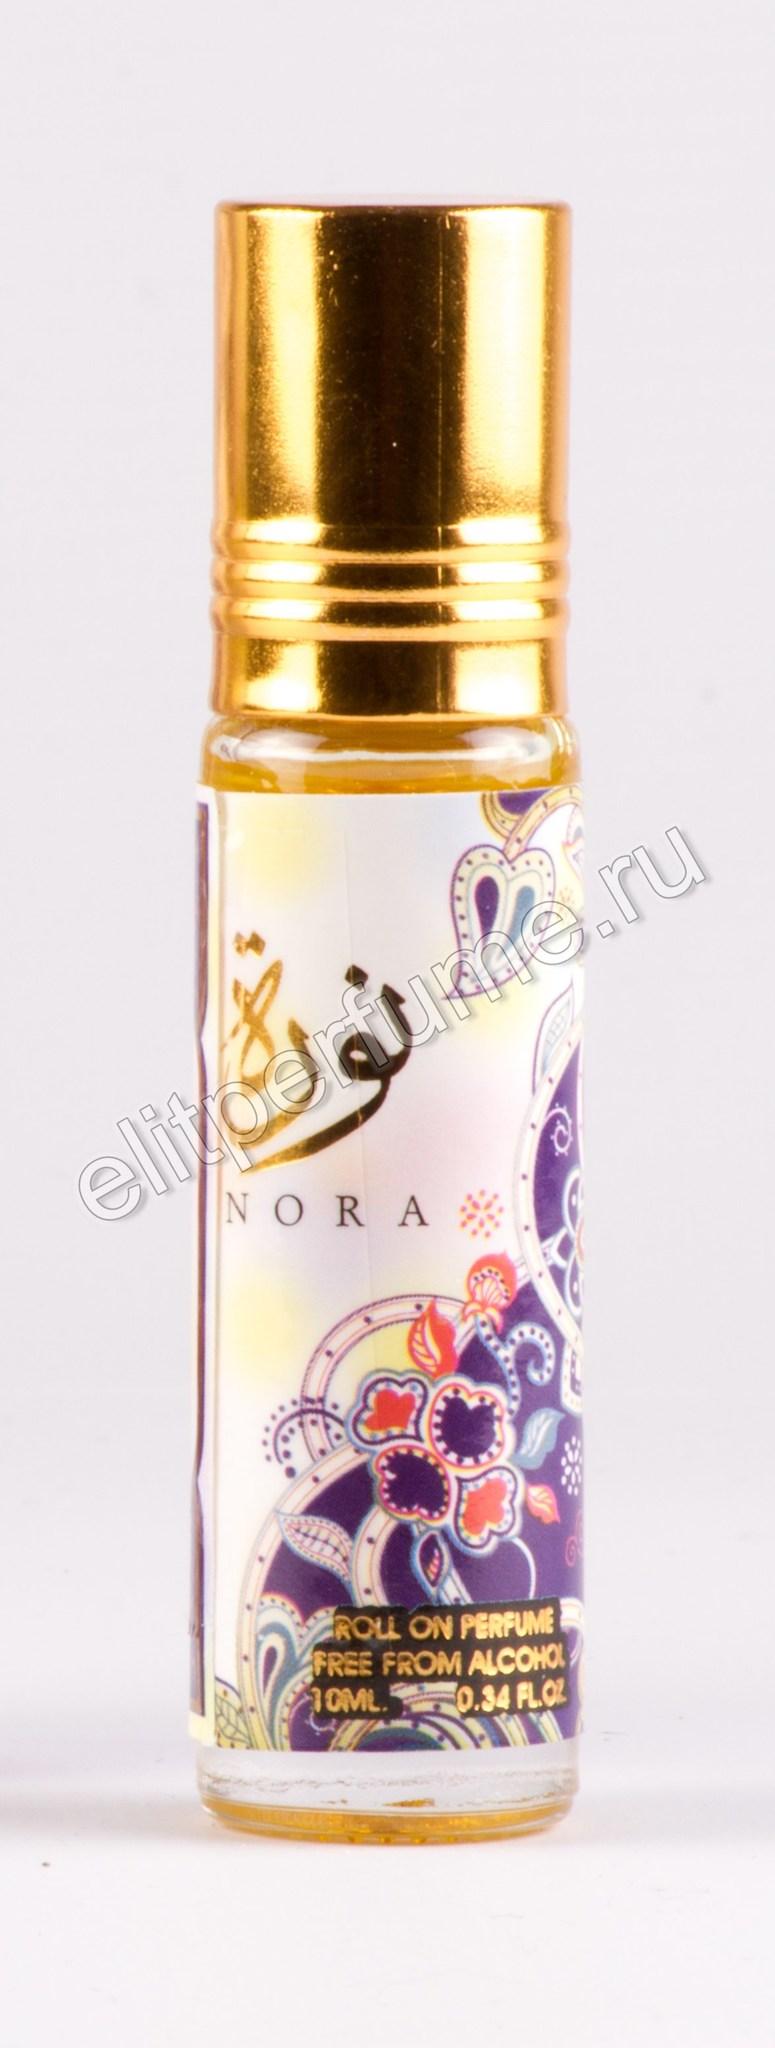 Nora Нора 10 мл арабские масляные духи от Ард Аль Заафаран Ard Al Zaafaran